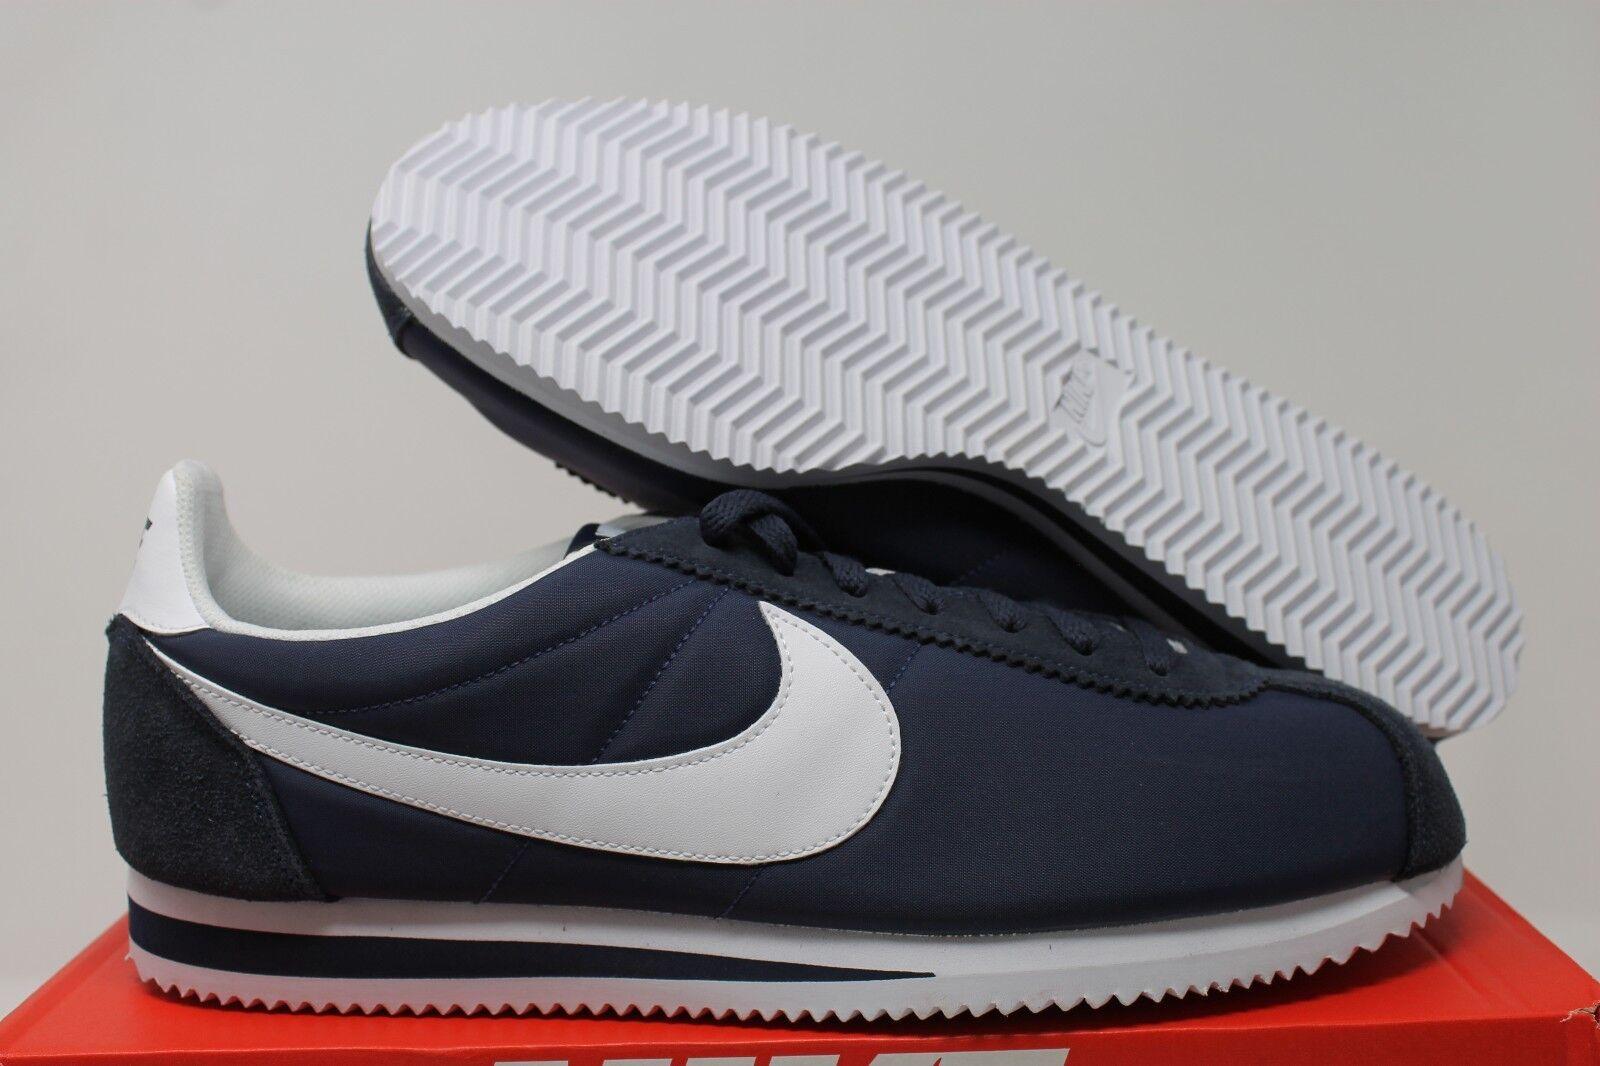 18f4b577bfb Nike Classic Cortez Nylon Men Lifestyle Casual SNEAKERS Obsidian ...